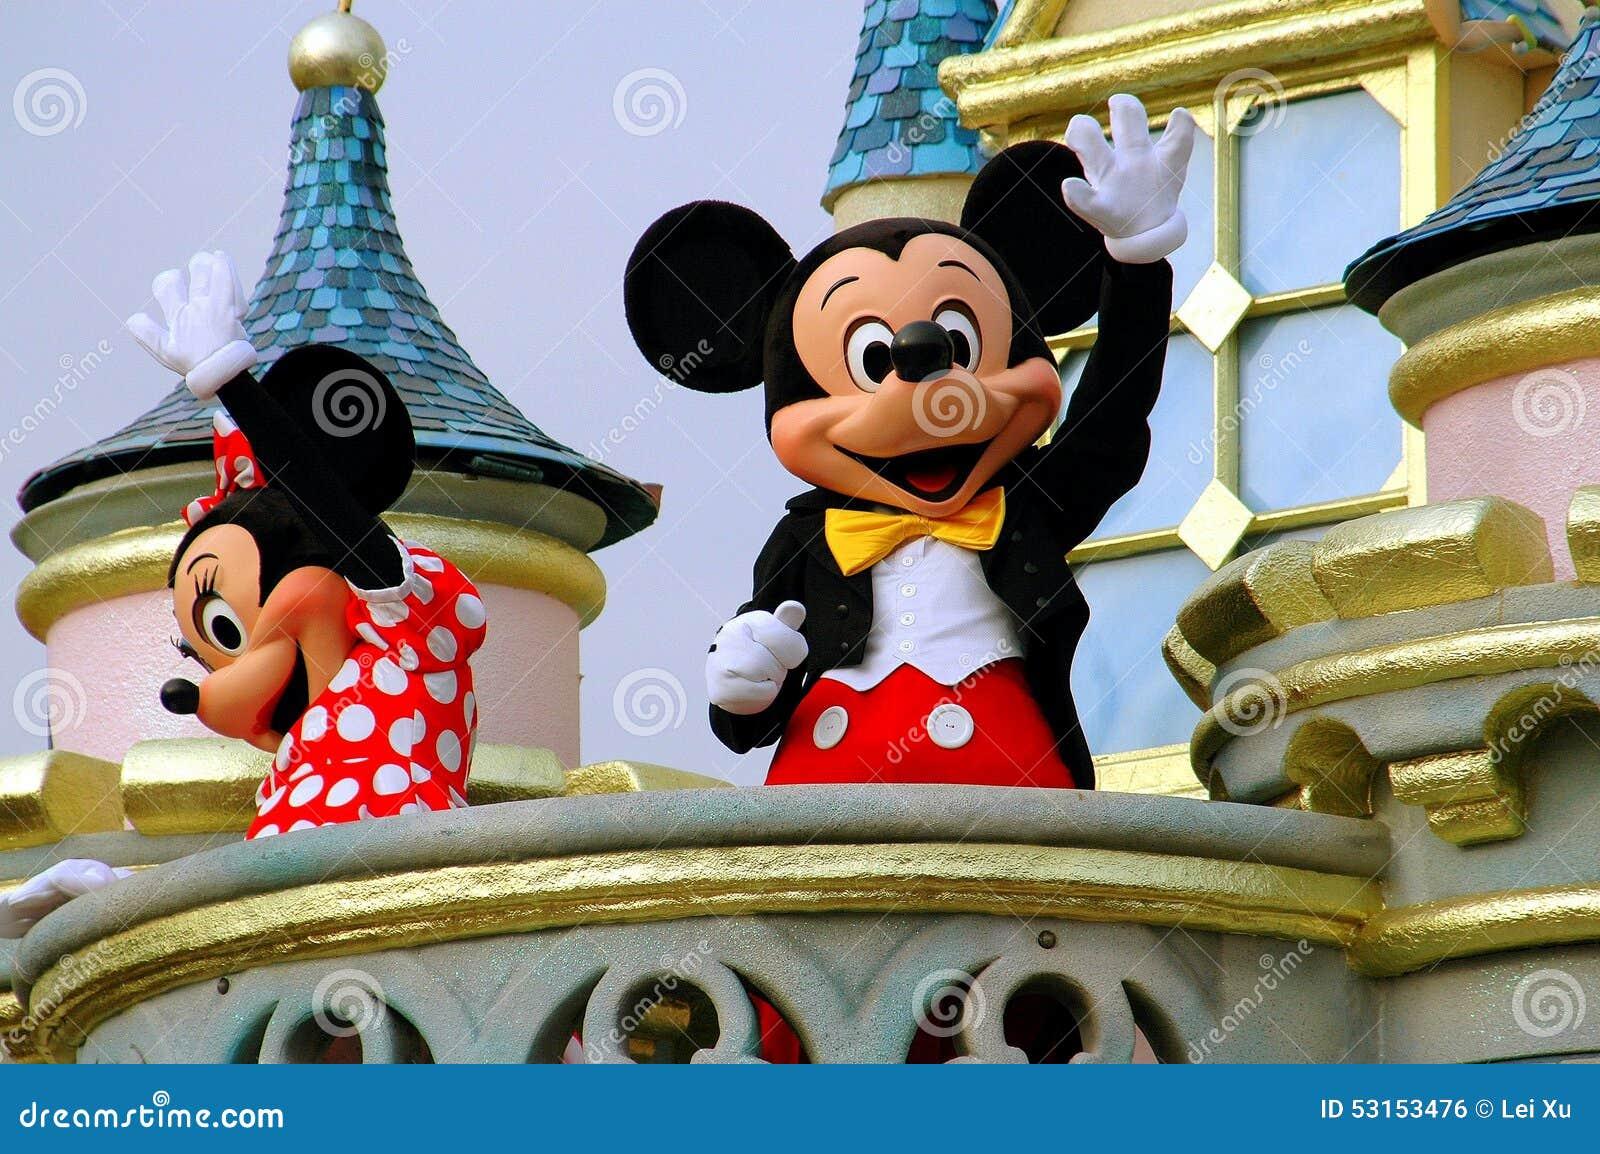 Hong Kong, China: Mickey e Minnie Mouse em Disneylândia